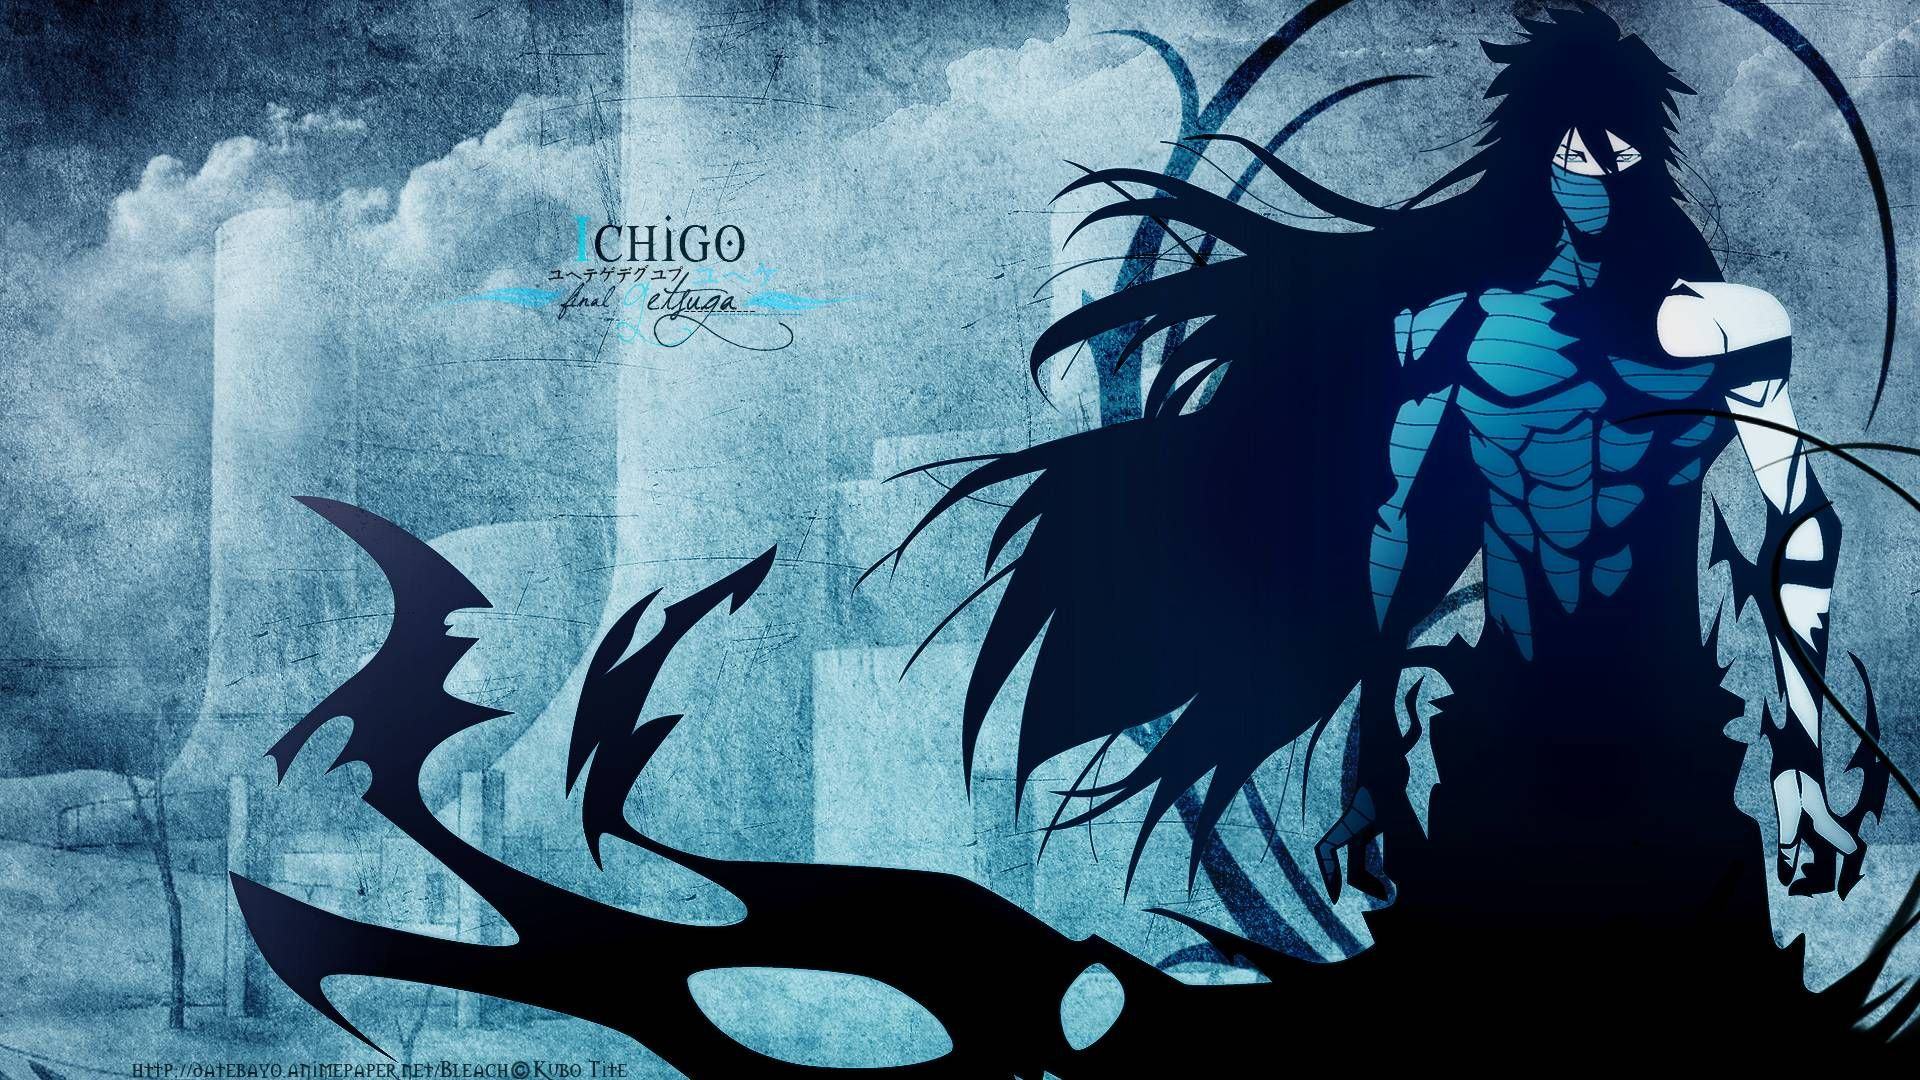 Bleach Kurosaki Ichigo Final Getsuga Tenshou Mugetsu Wallpaper Bleach Anime Ichigo Anime Wallpaper Bleach Anime